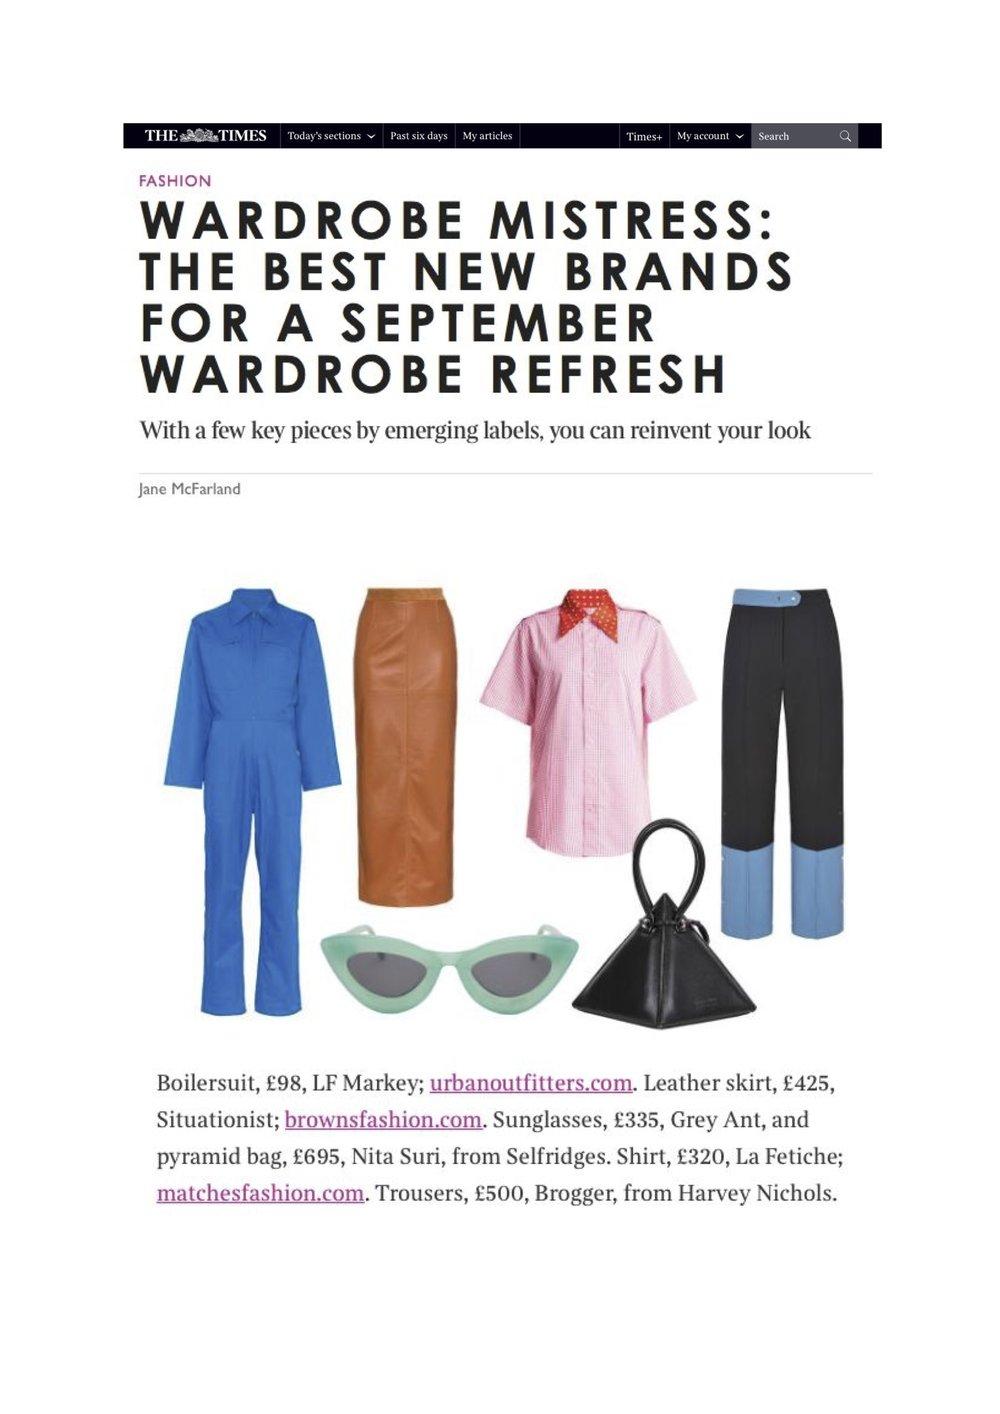 The Sunday Times Style - The Wardrobe Mistress by Jane McFarland September 2nd 2018